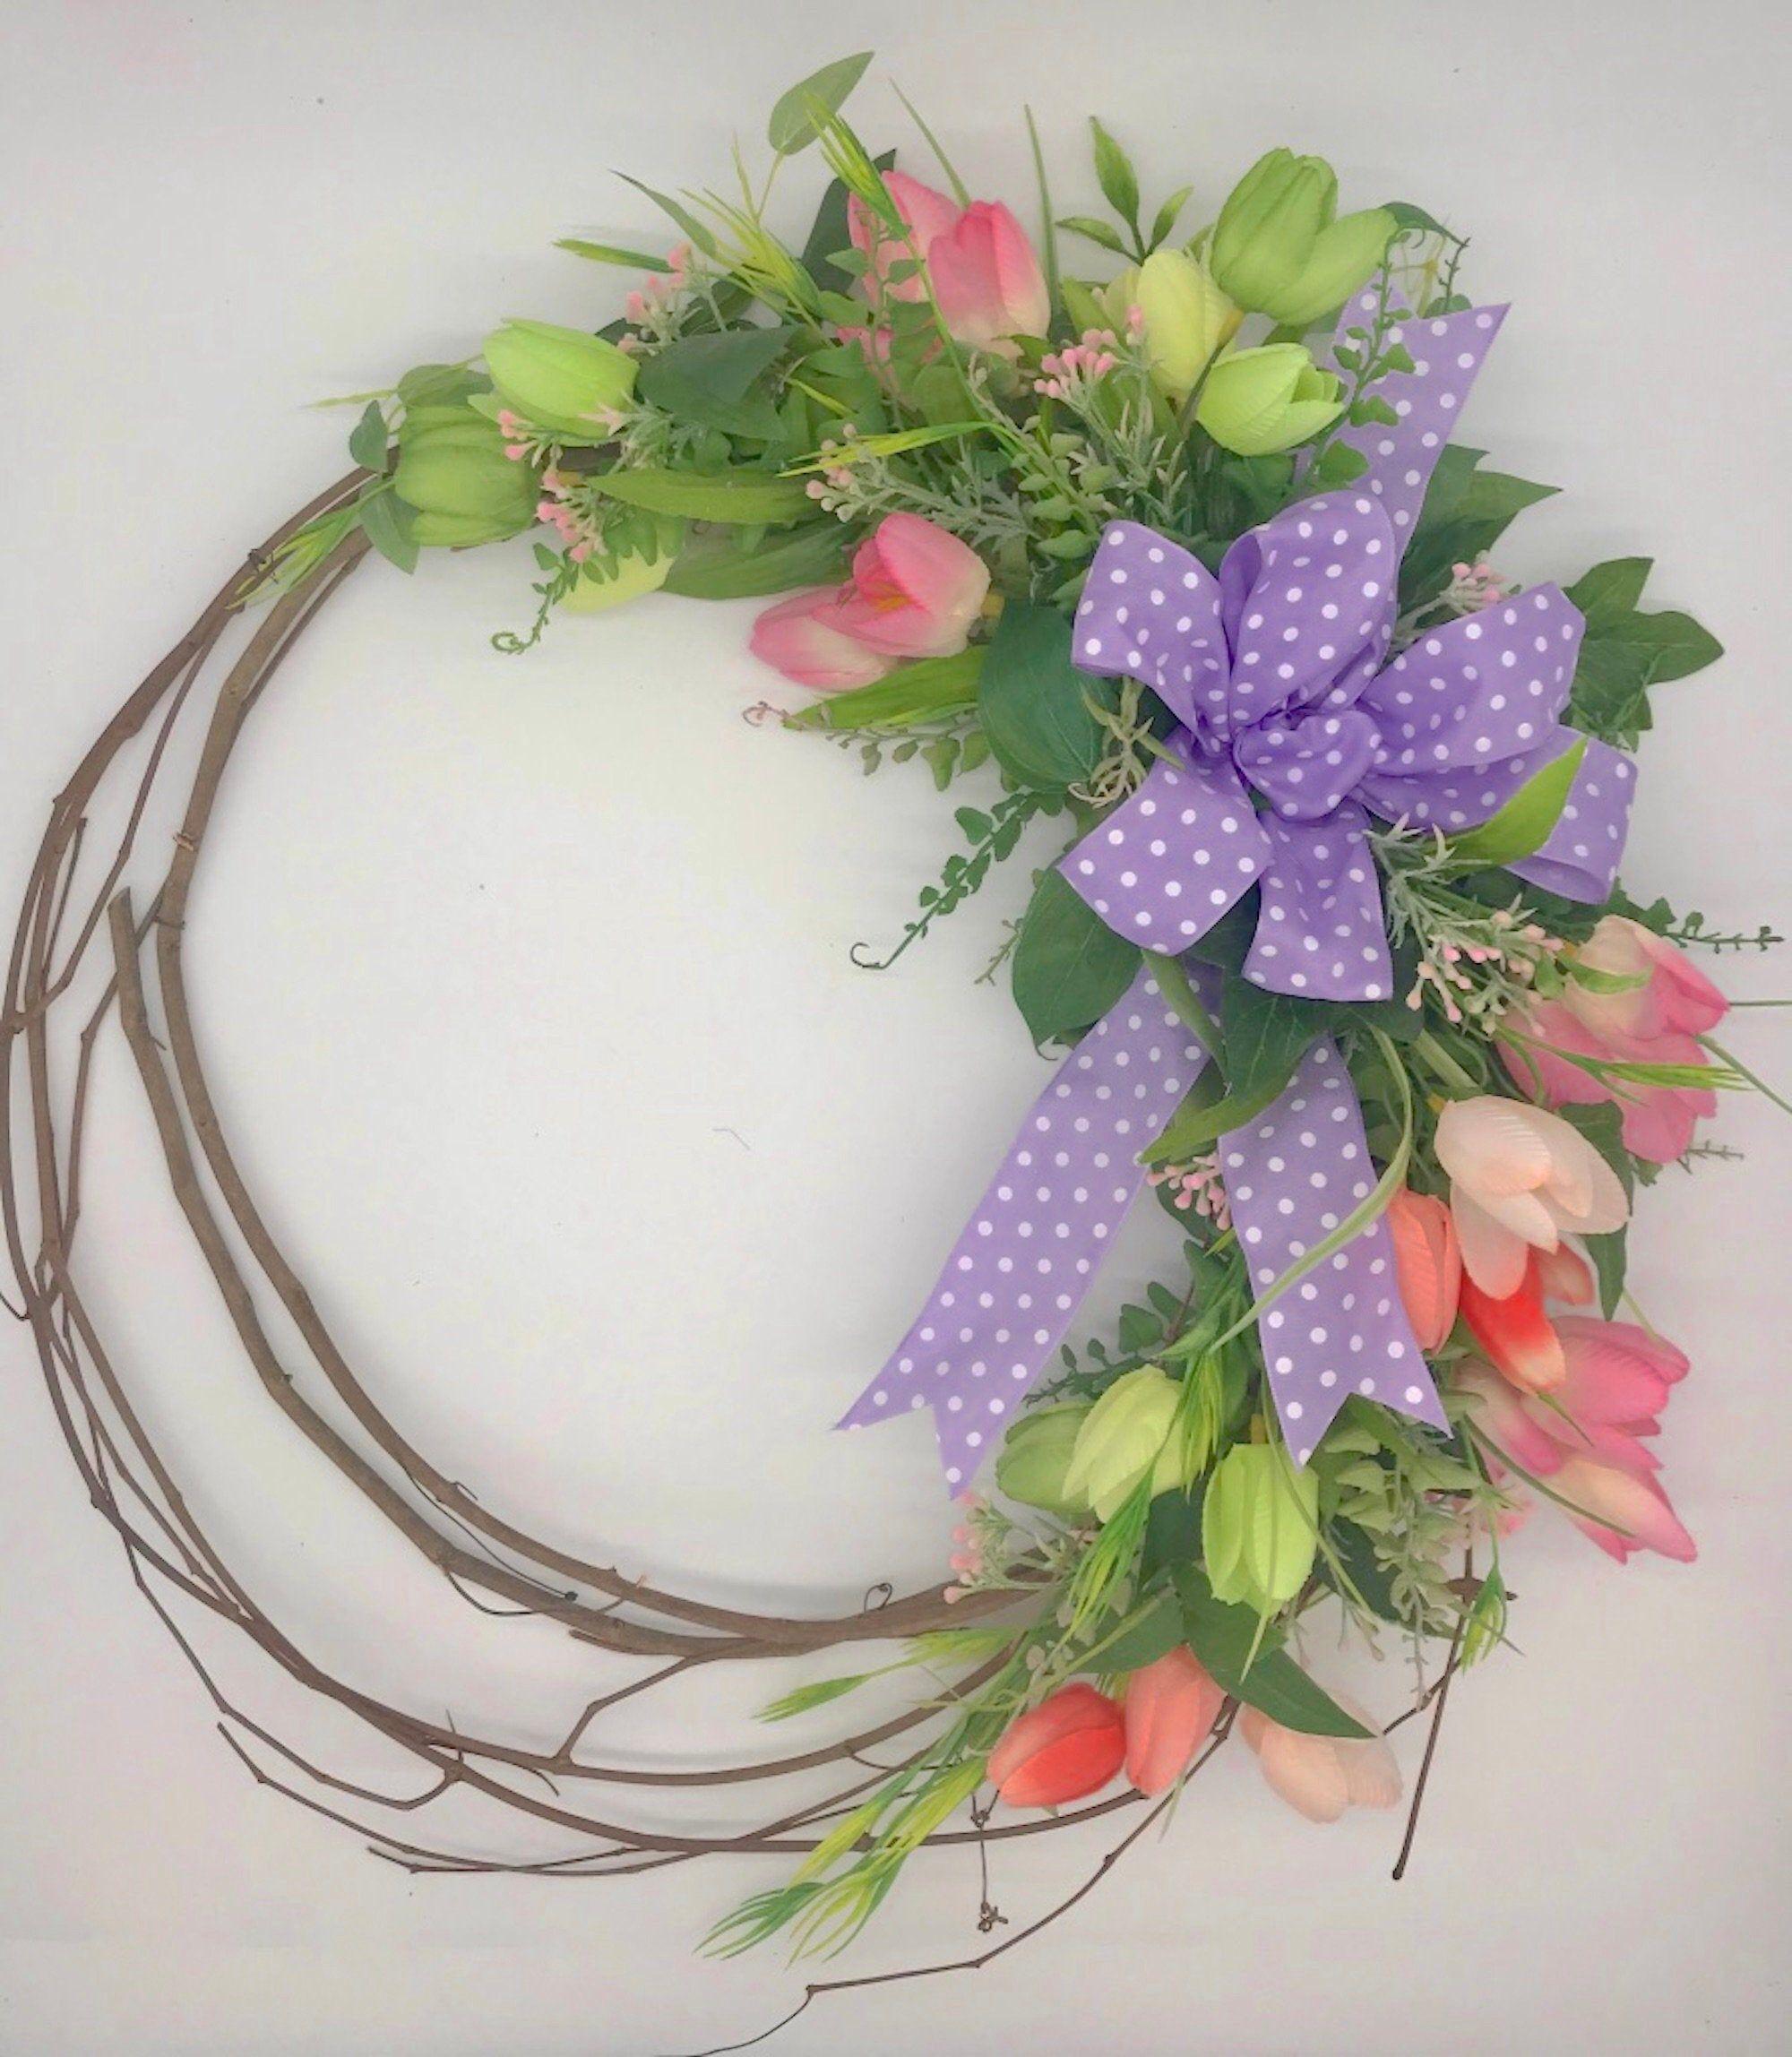 Photo of Tulip Wreath, Spring Hoop Wreath, Modern Wreath, Simple Grapevine Wreath, Spring Tulip Wreath for Front Door, Simple Farmhouse Wreath